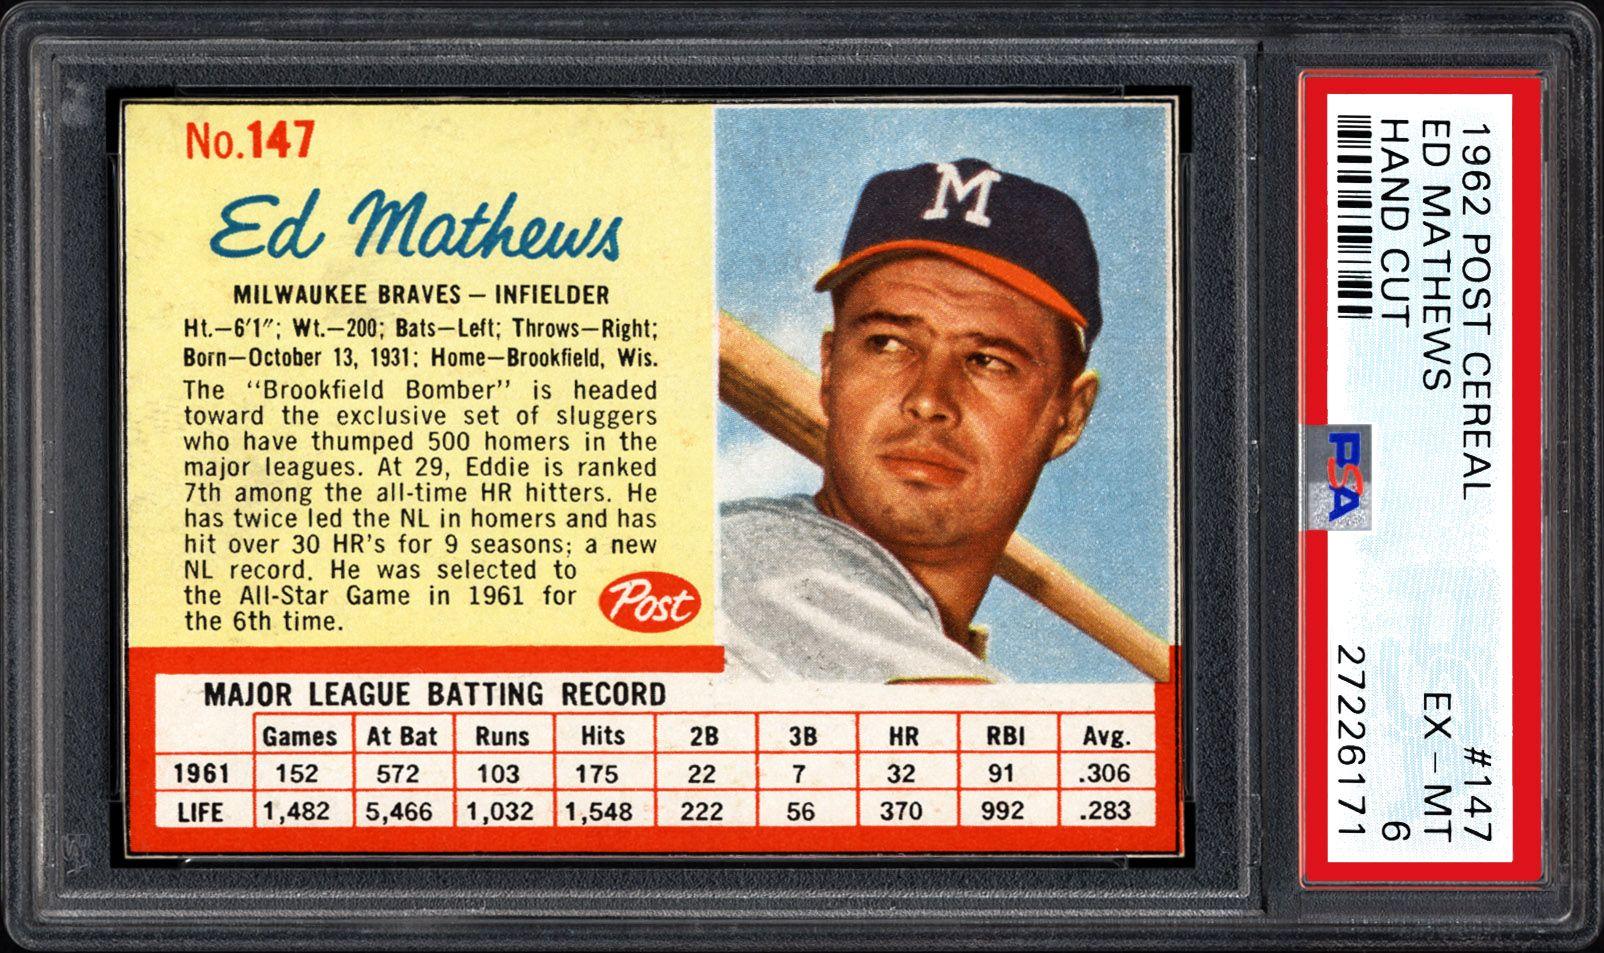 1962 Post Cereal Baseball Cards Psa Smr Price Guide